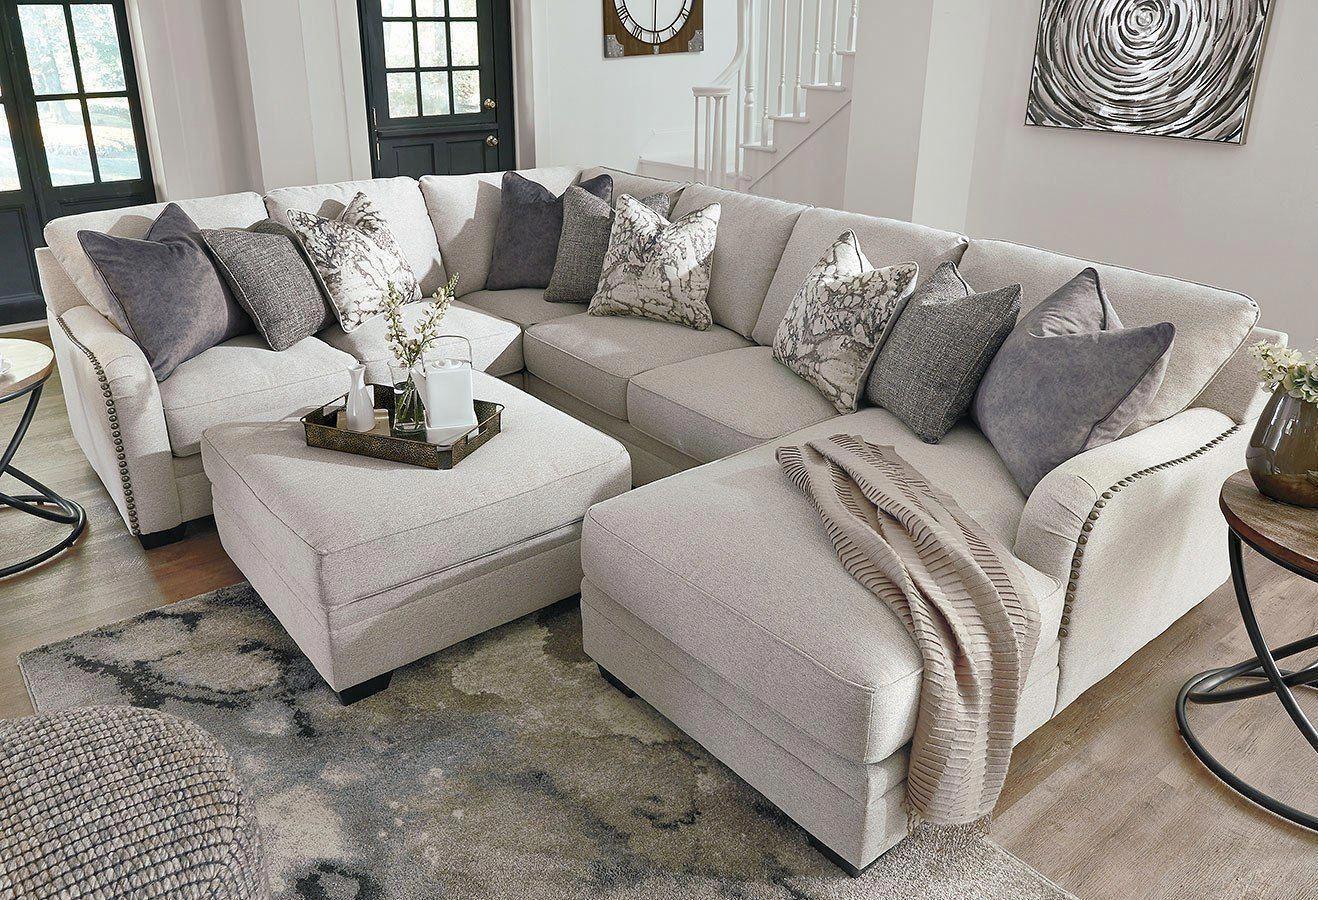 Dellara Chalk Modular Sectional Set in 2020 | Living room ...